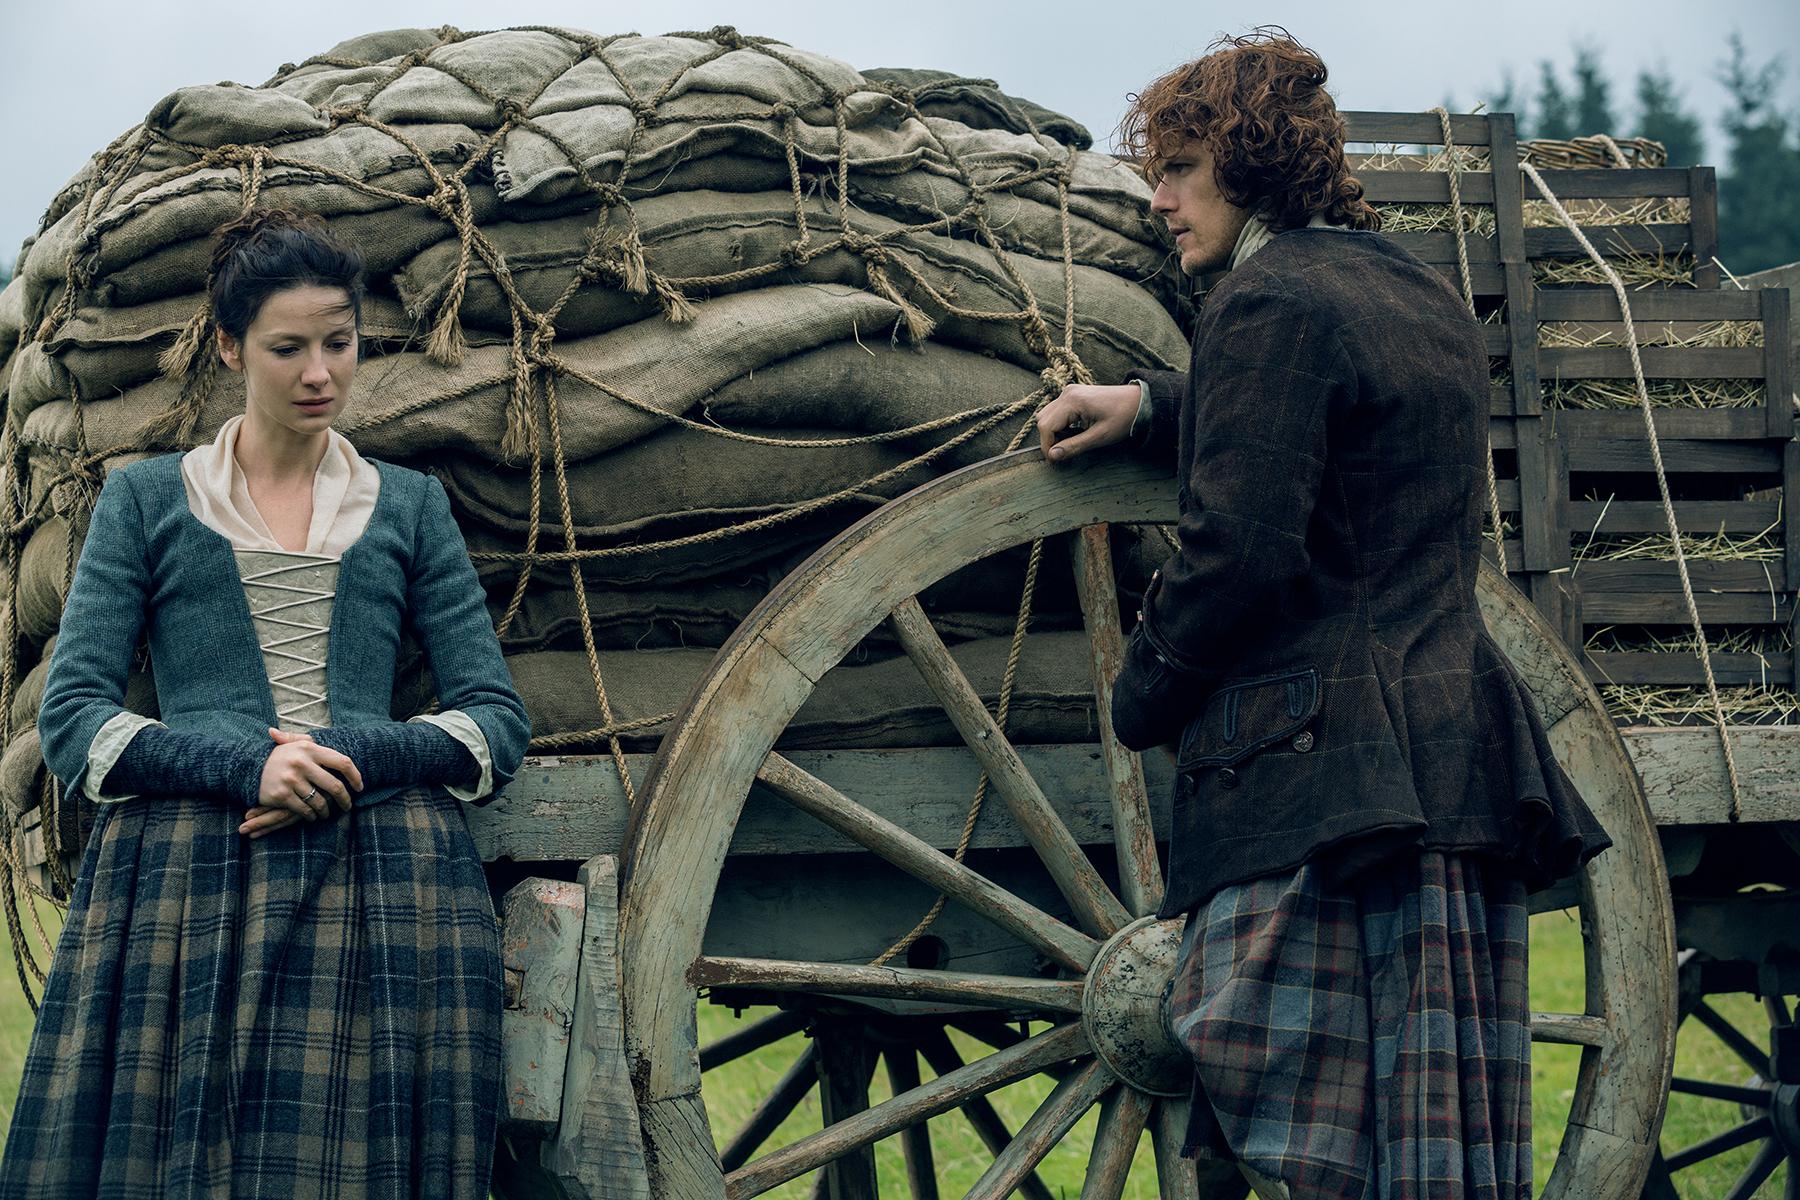 Caitriona Balfe as Claire Fraser and Sam Heughan as Jamie Fraser in 'Outlander' Season 2, Episode 9 — 'Je Suis Prest'